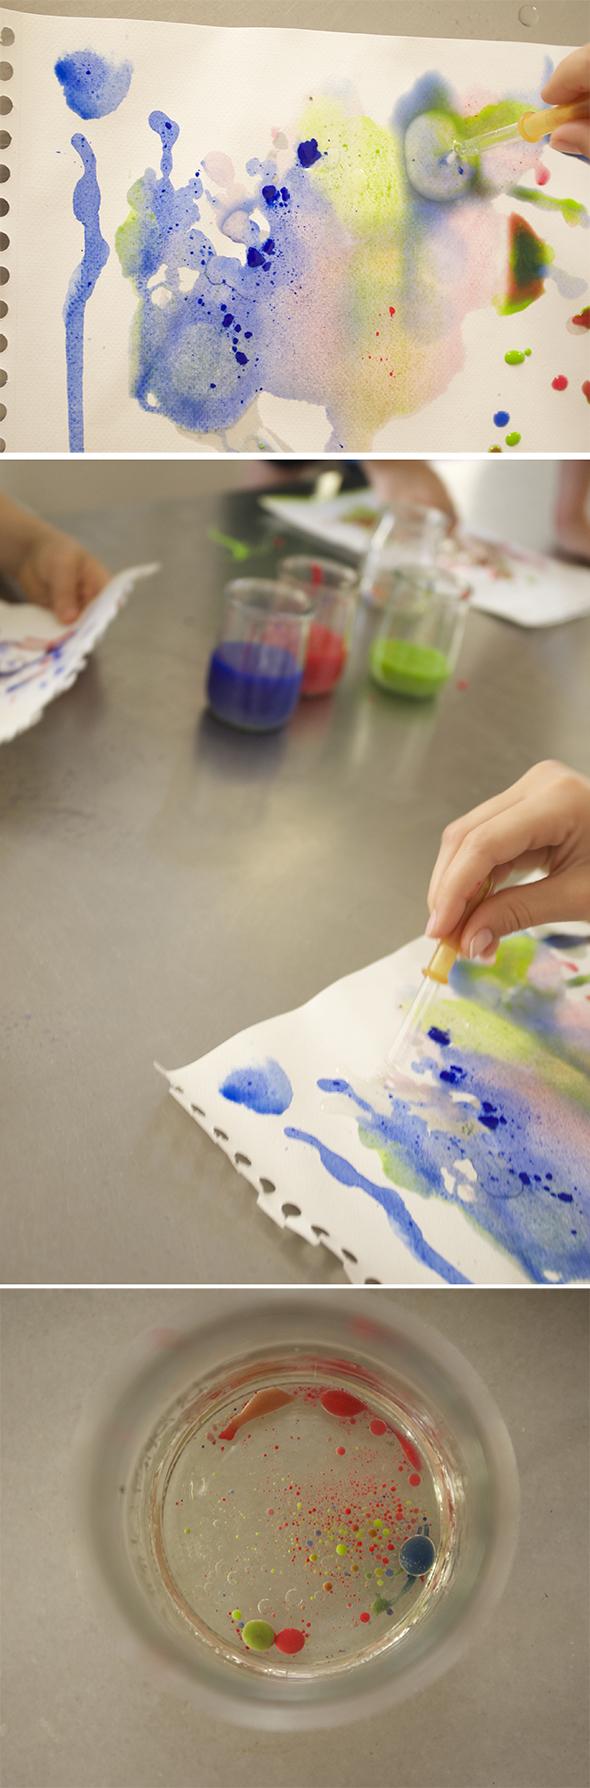 pintar contargotas pipete aceite color Color oil paint pipette Farbe Öl Pipette kinder kids niños arte kunst art